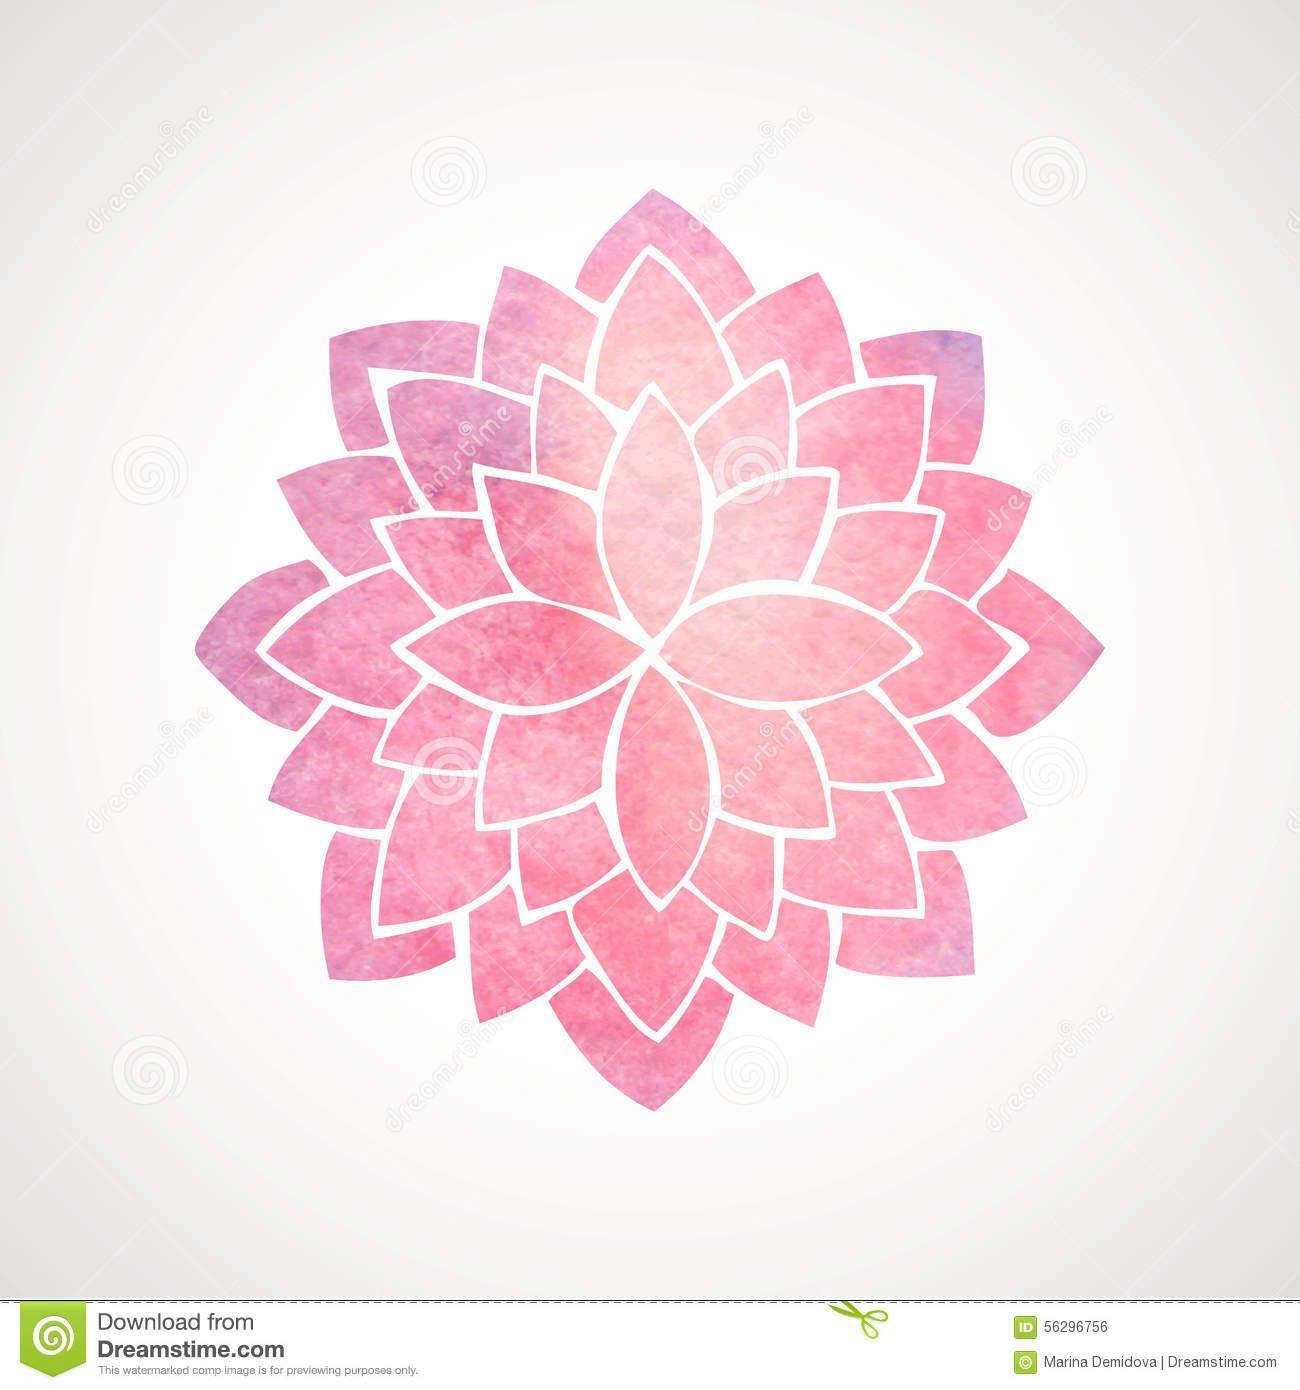 Pin By Marilyn Cain On Cricut Pinterest Lotus Mandala Flower